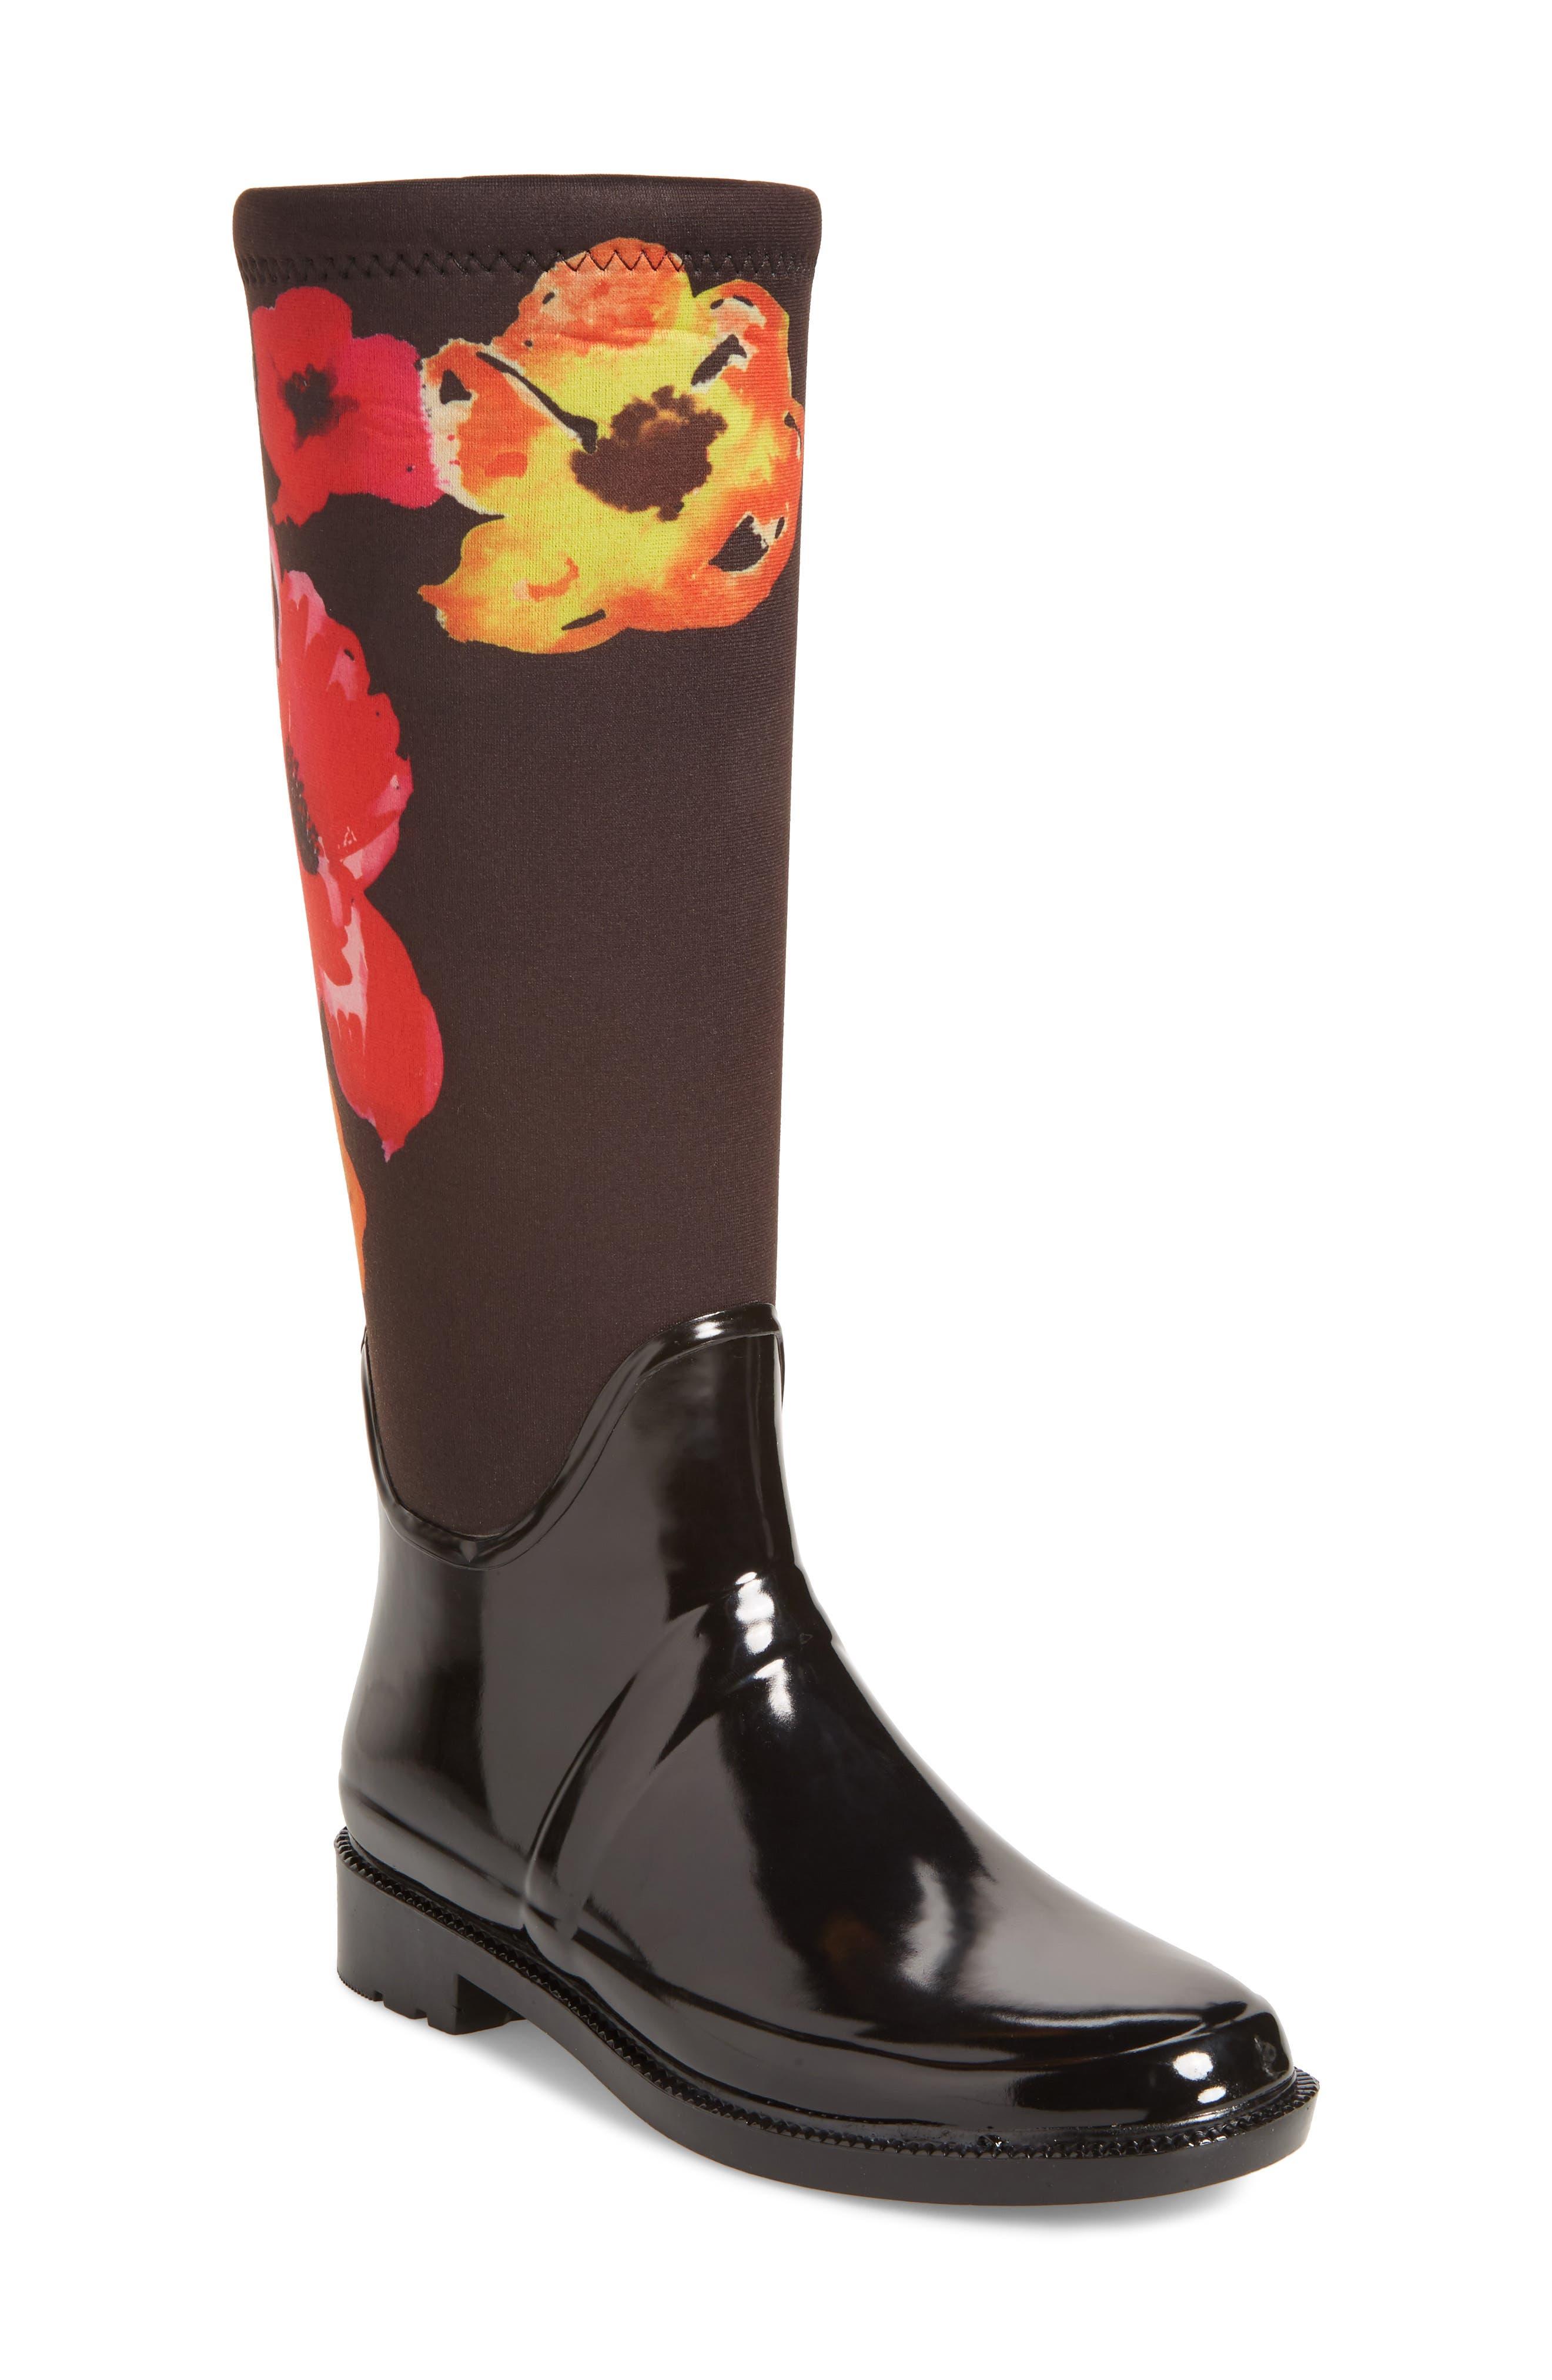 Cougar Talon Waterproof Rain Boot, Black